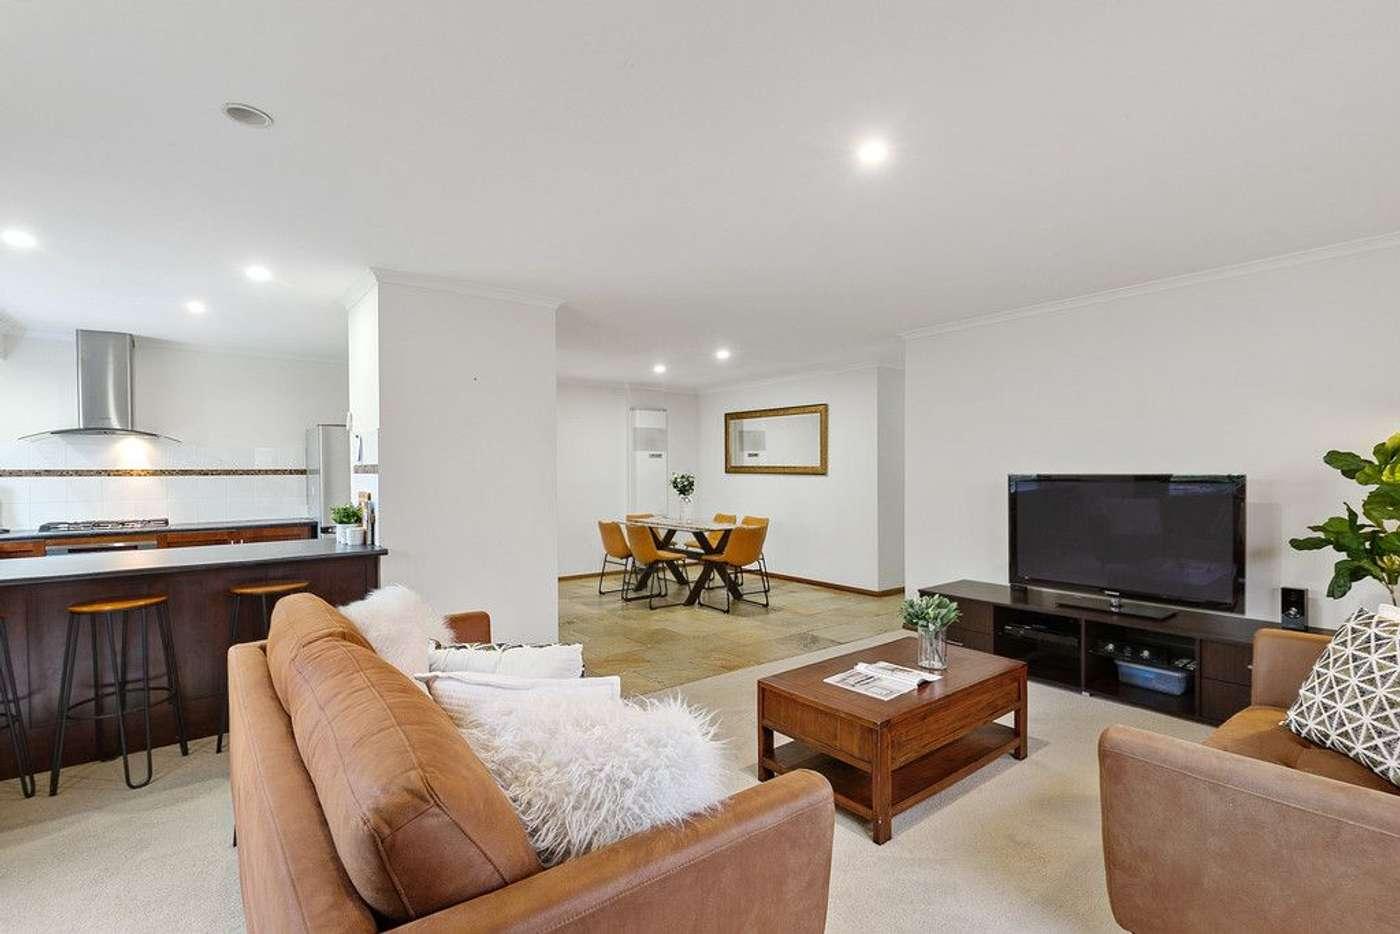 Sixth view of Homely house listing, 40 Horseshoe Drive, Aberfoyle Park SA 5159